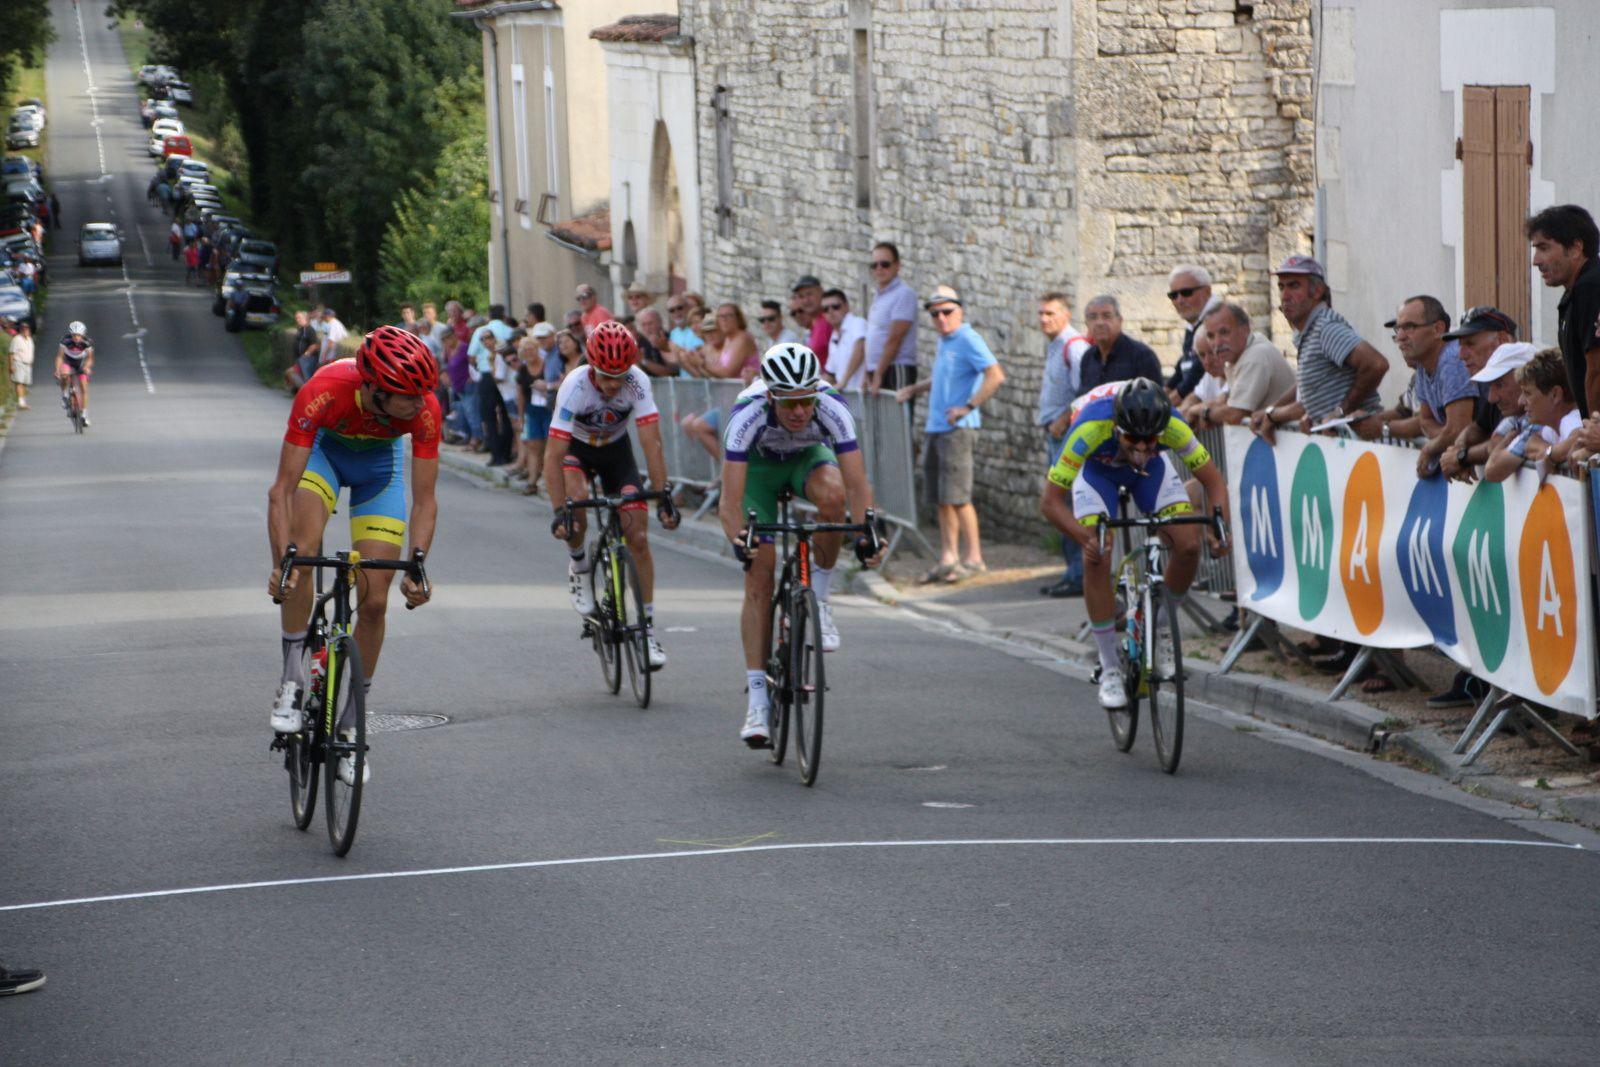 8e  Rudy  FIEFVEZ(AC  Nersac), 9e Yoan  PAILLOT(CO La Couronne),10e  Jacques  ABISROR(AC Jarnac-Aigre-Rouillac),